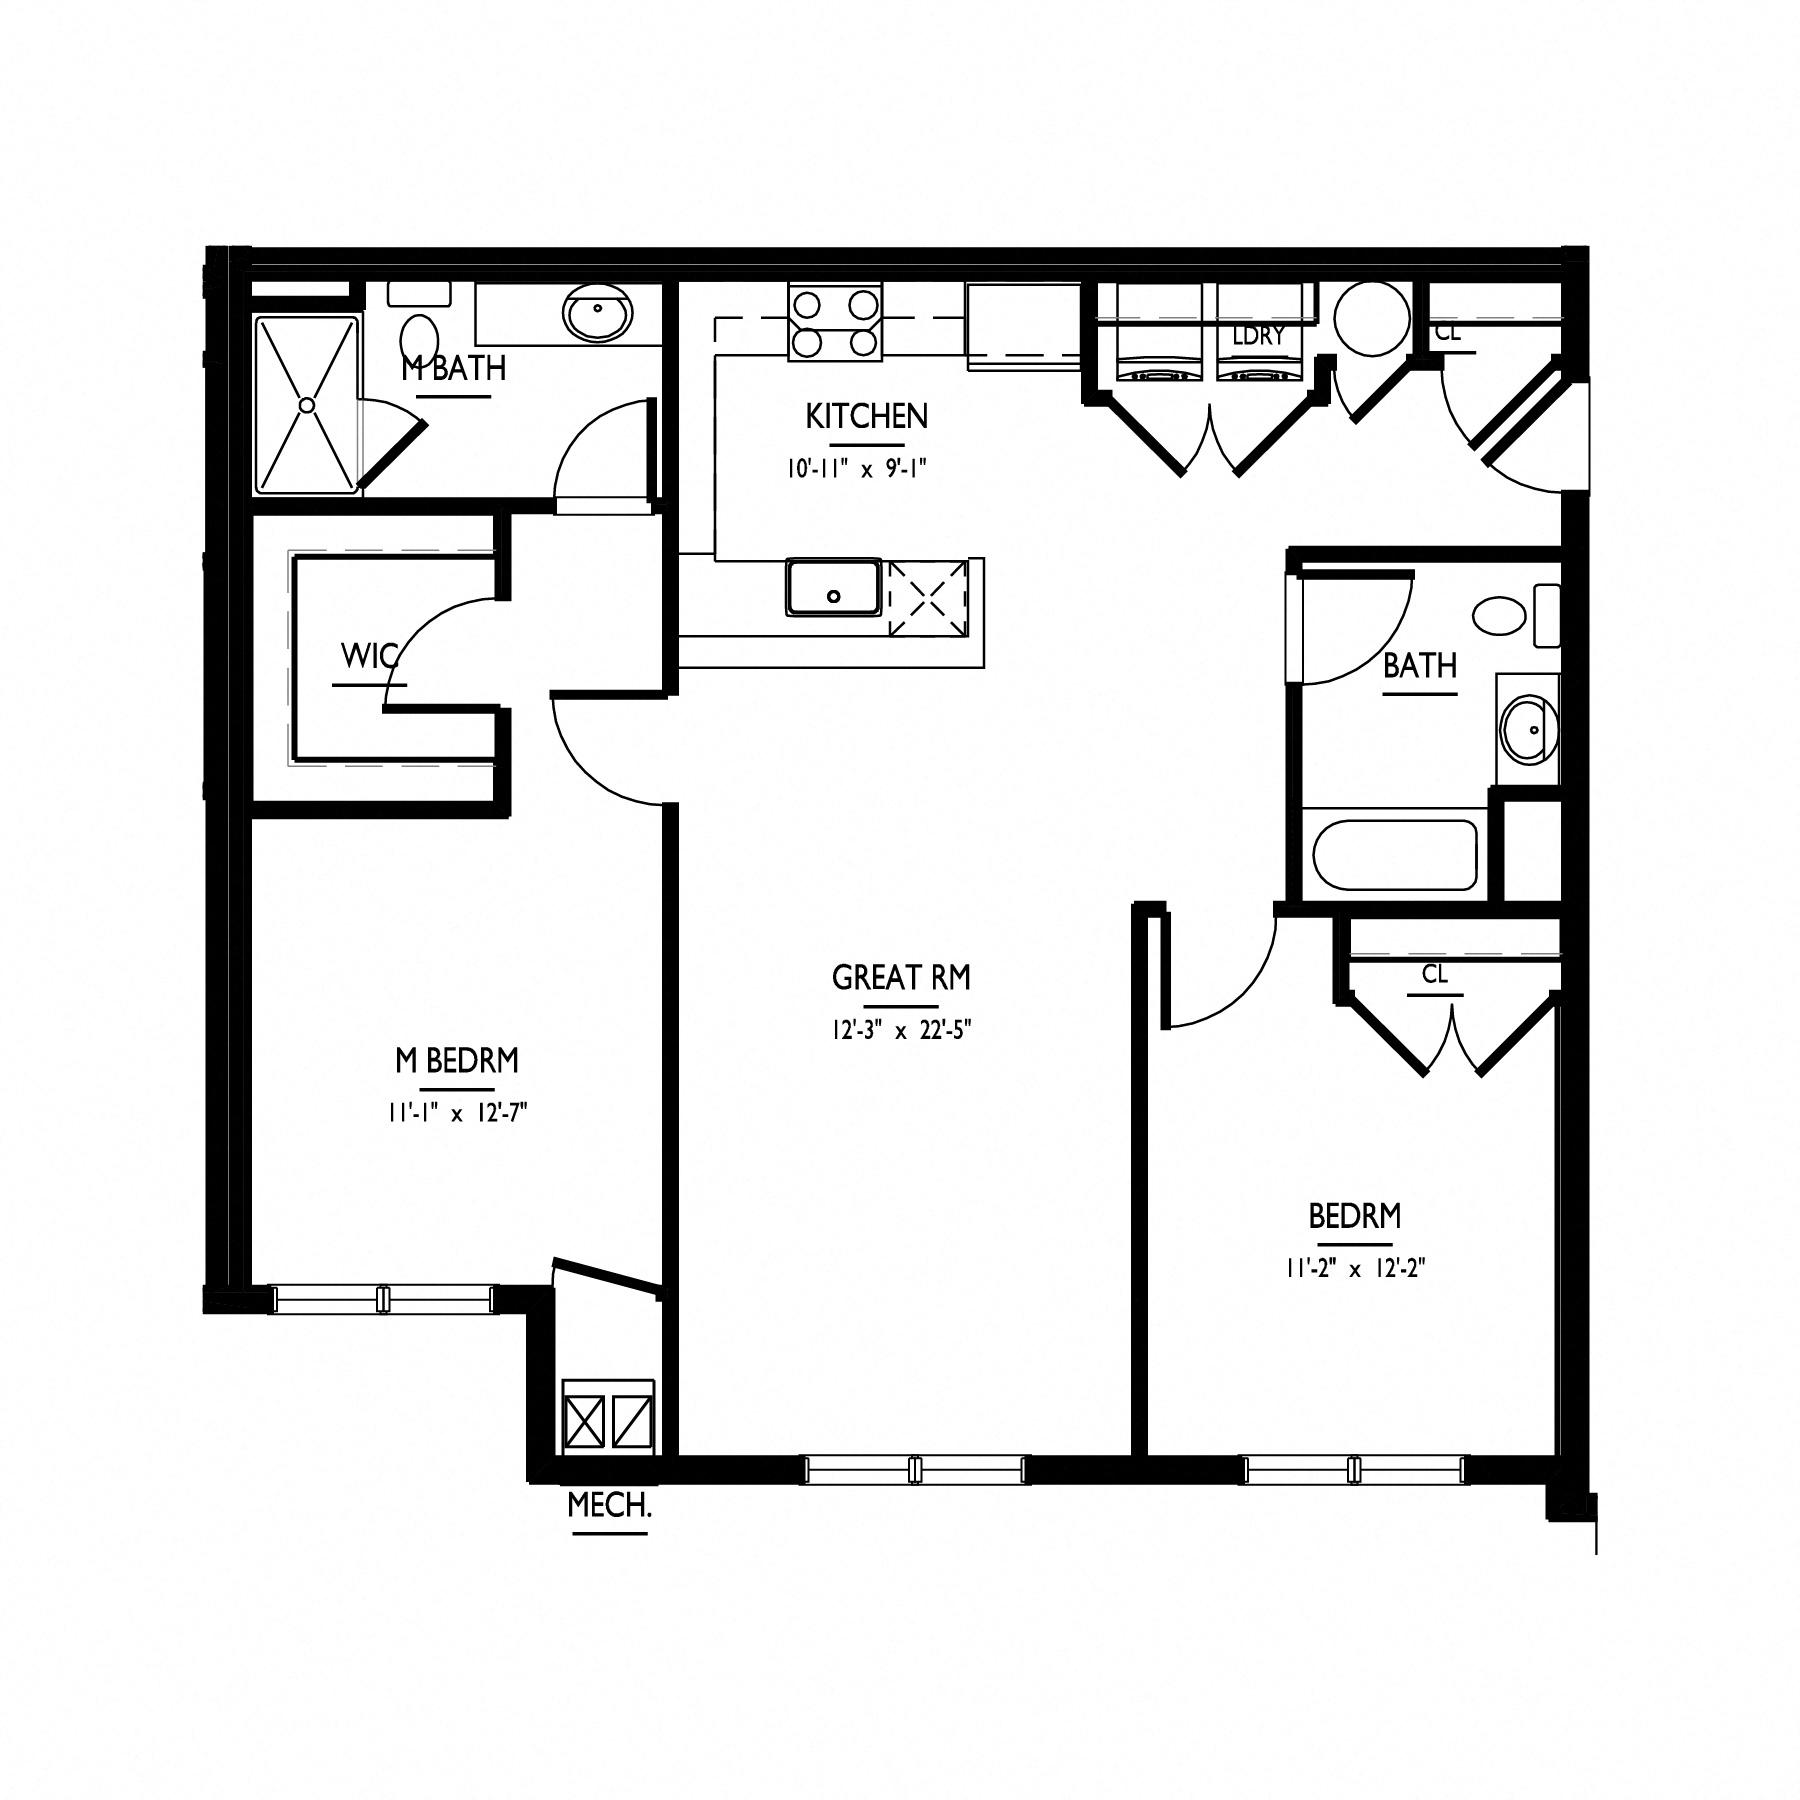 floorplan of apartment 0112